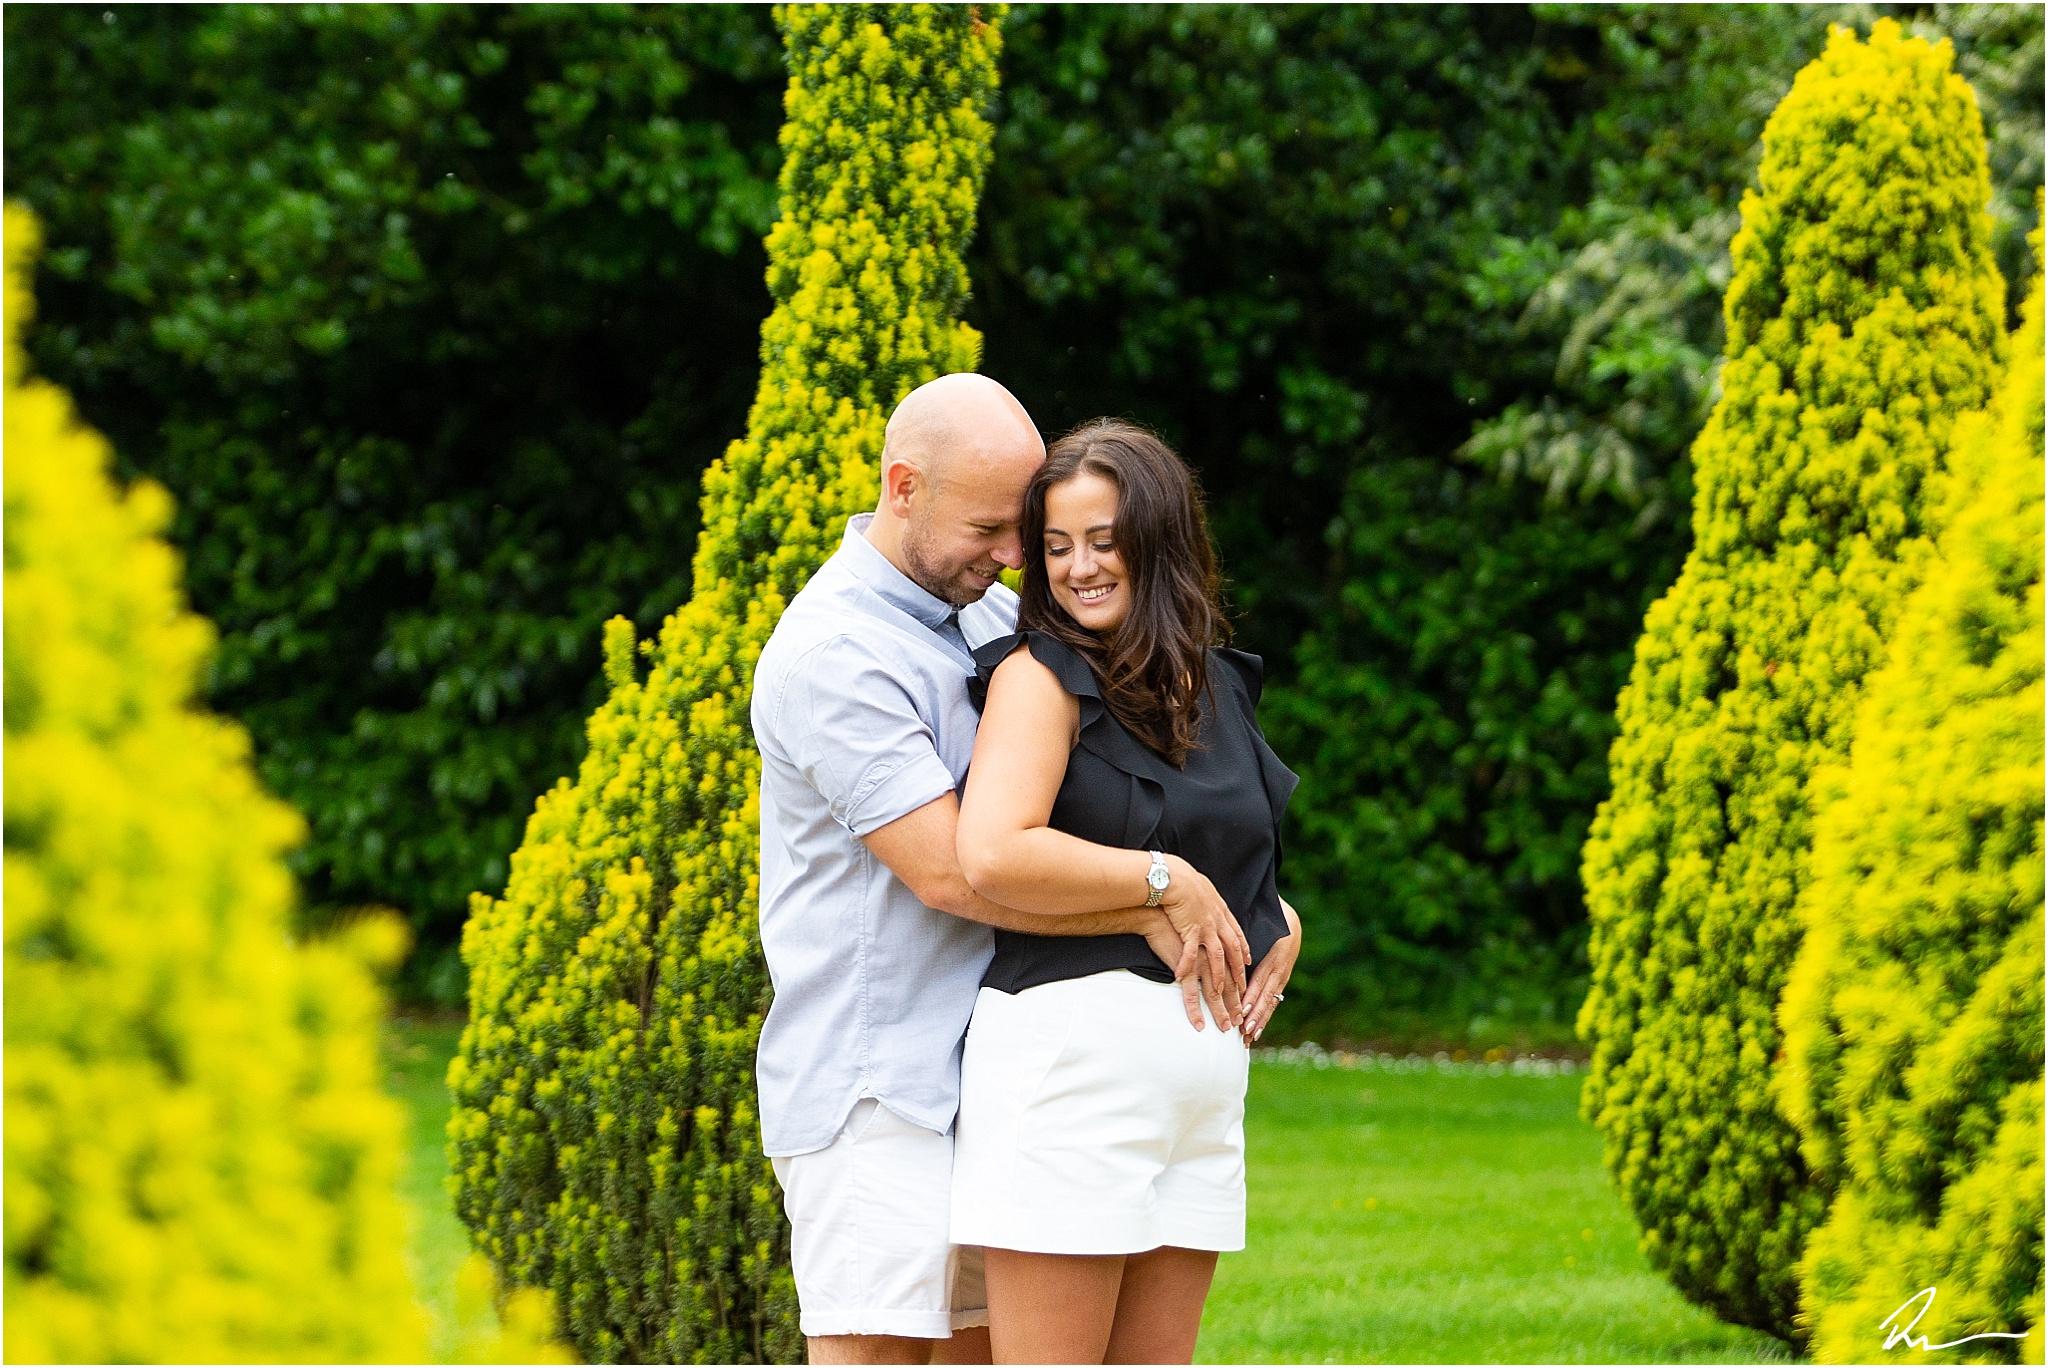 chelmsford-engagement-photographer